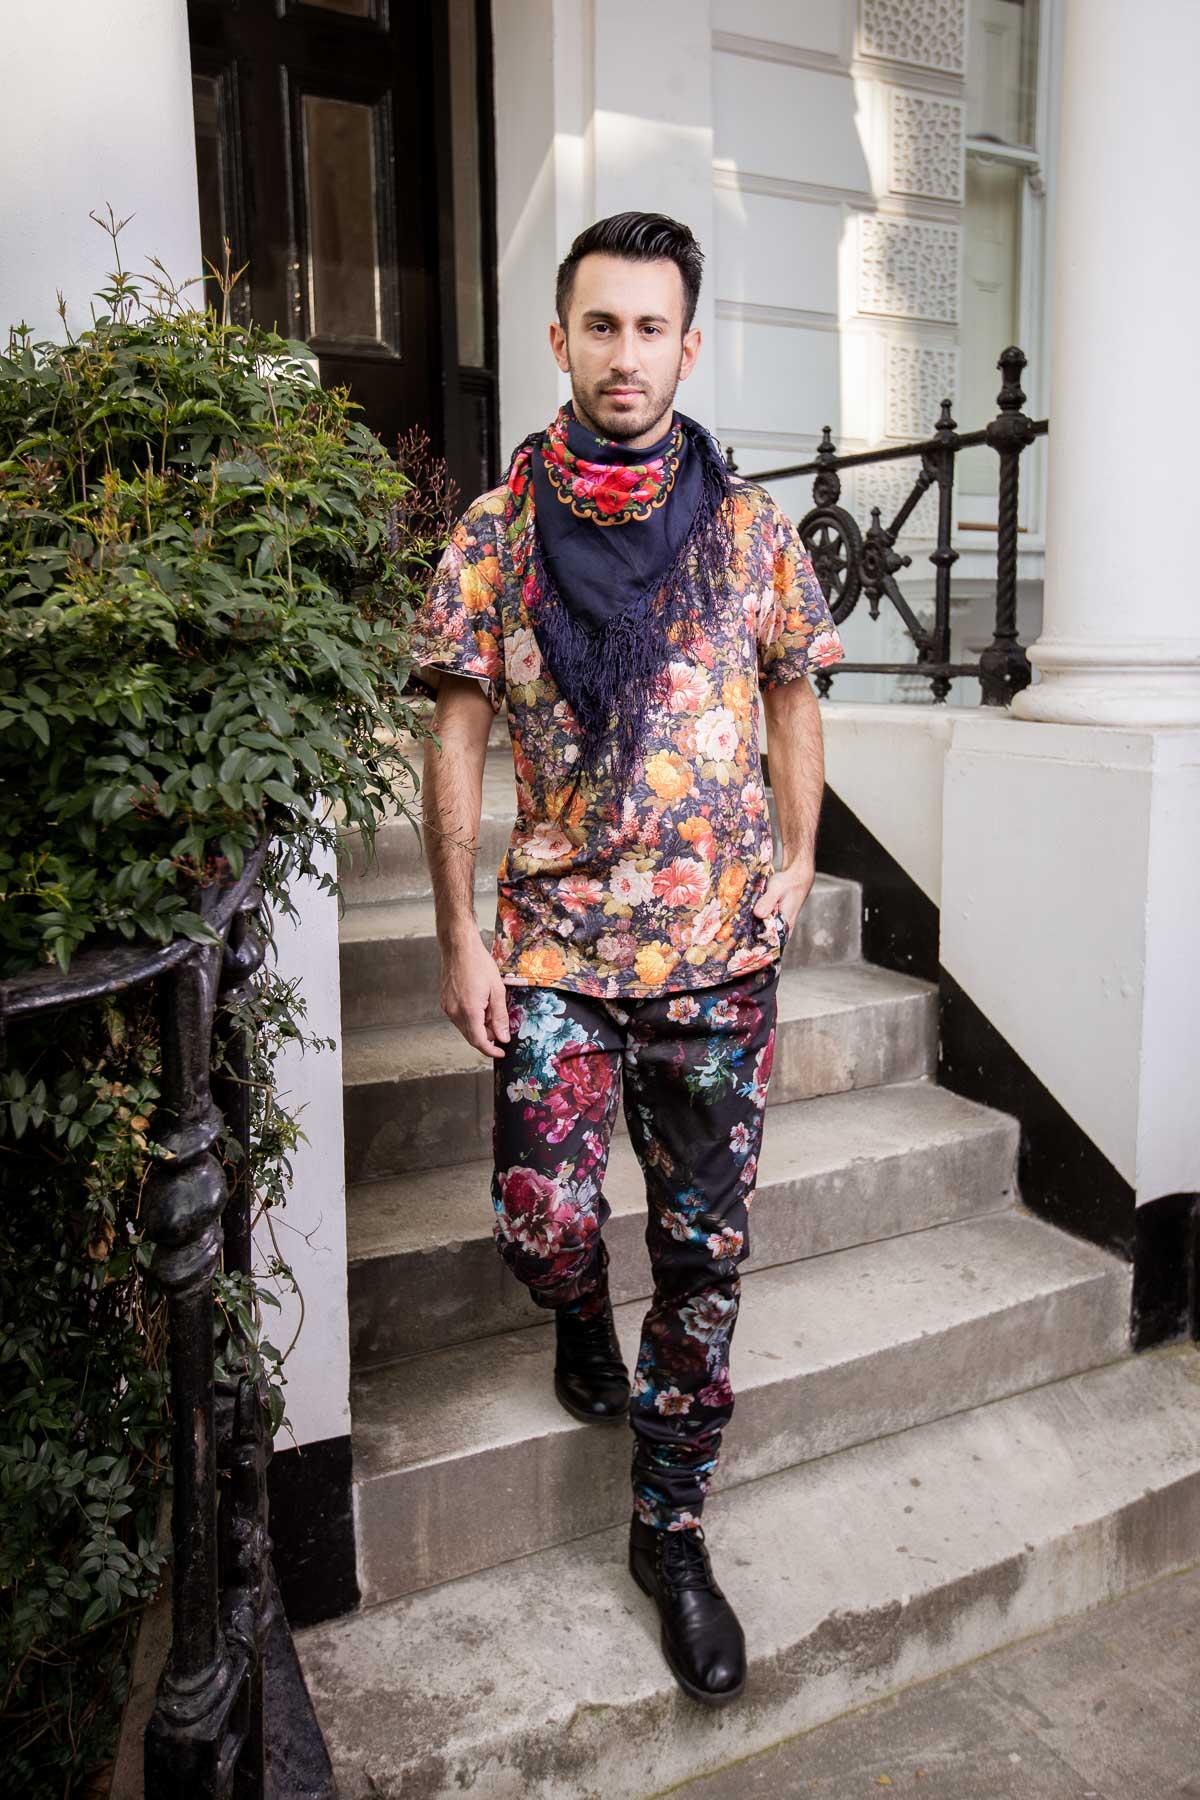 Russian-style-fashion-photographer-london-floral-Русский-стиль-мода-павловопосадский-платок-natalia-smith-photography-0030.jpg